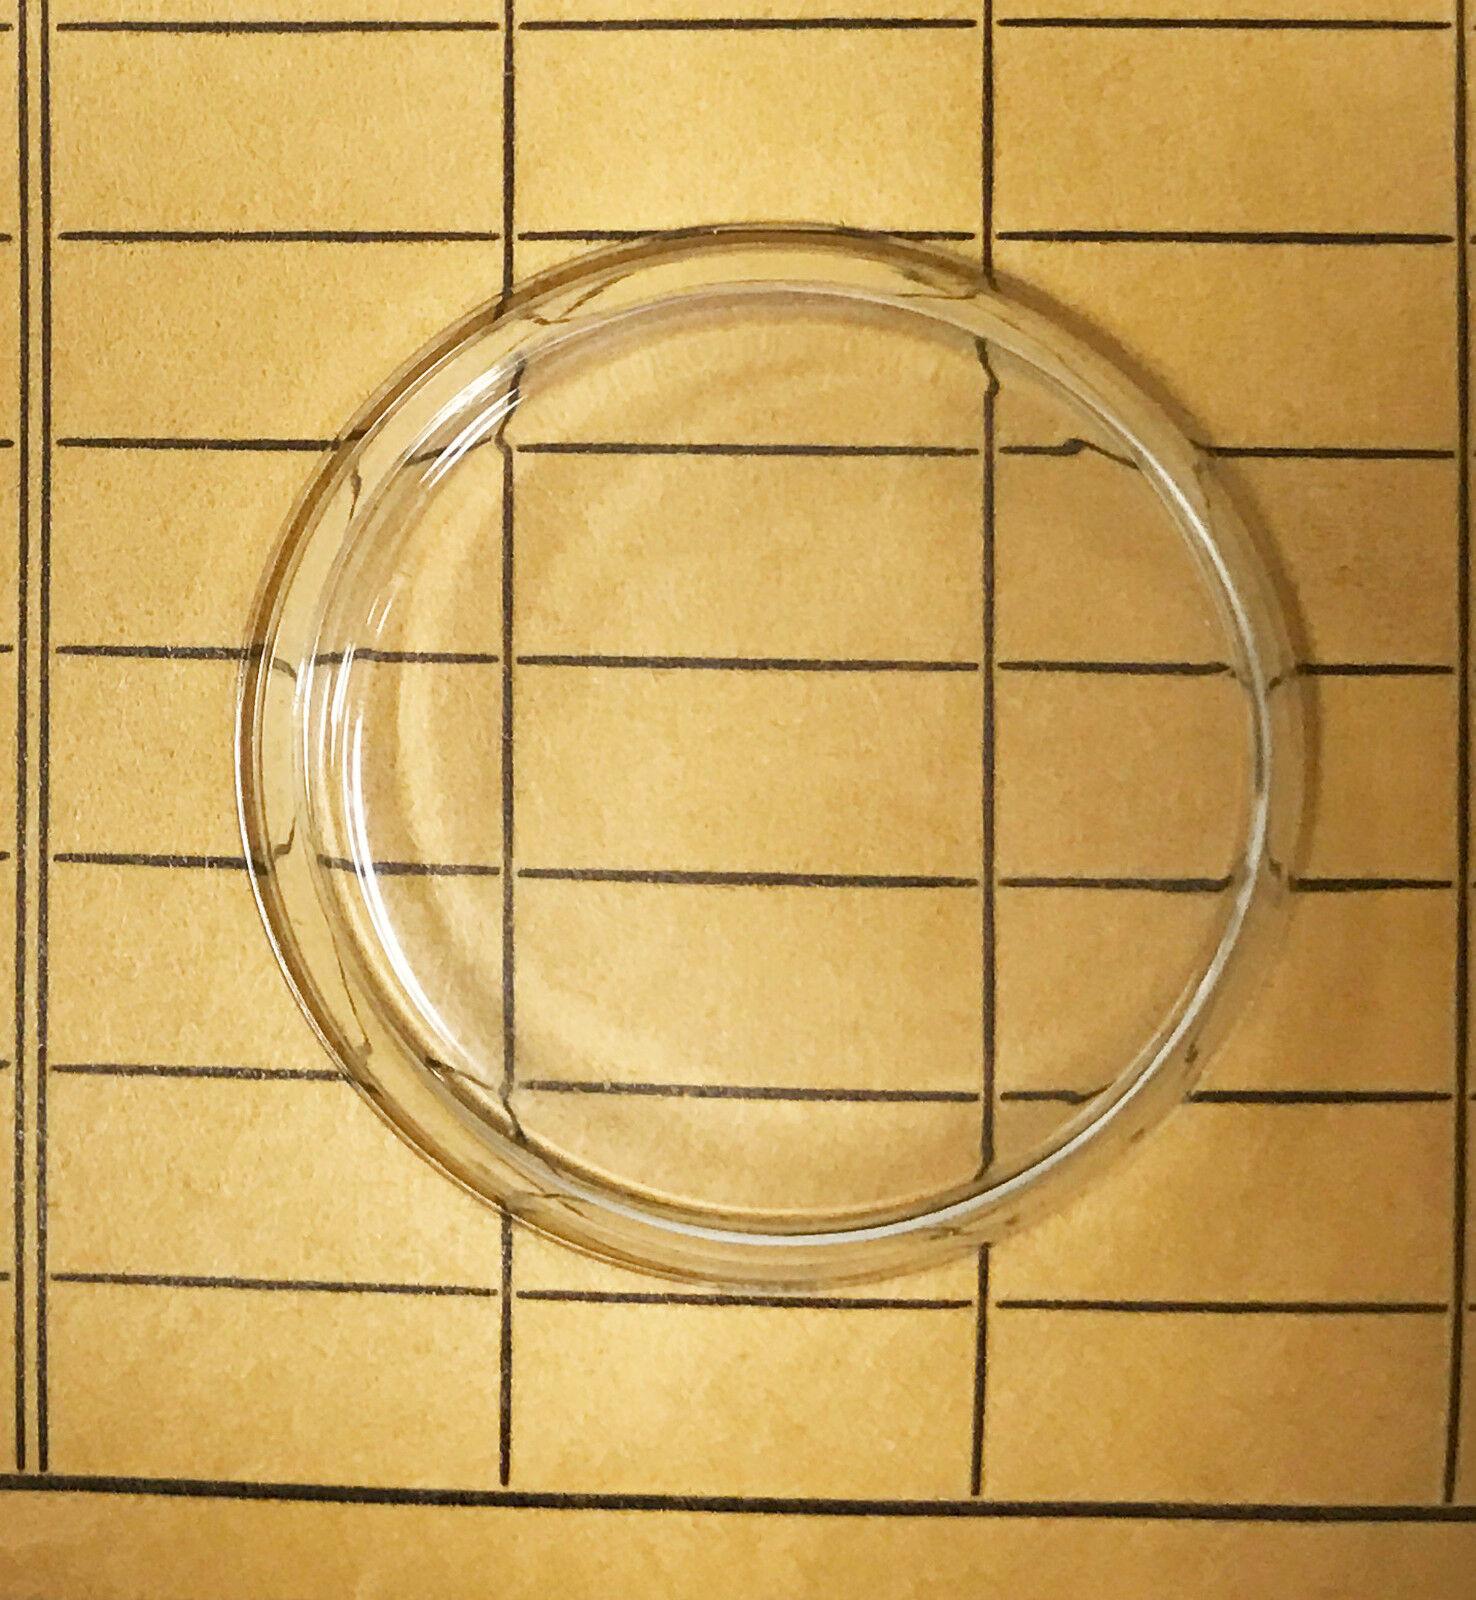 OMEGA 32MM DIAMETER STELLA WEC 320-30 1/2 DOME PLASTIC XTAL ACRYLIC